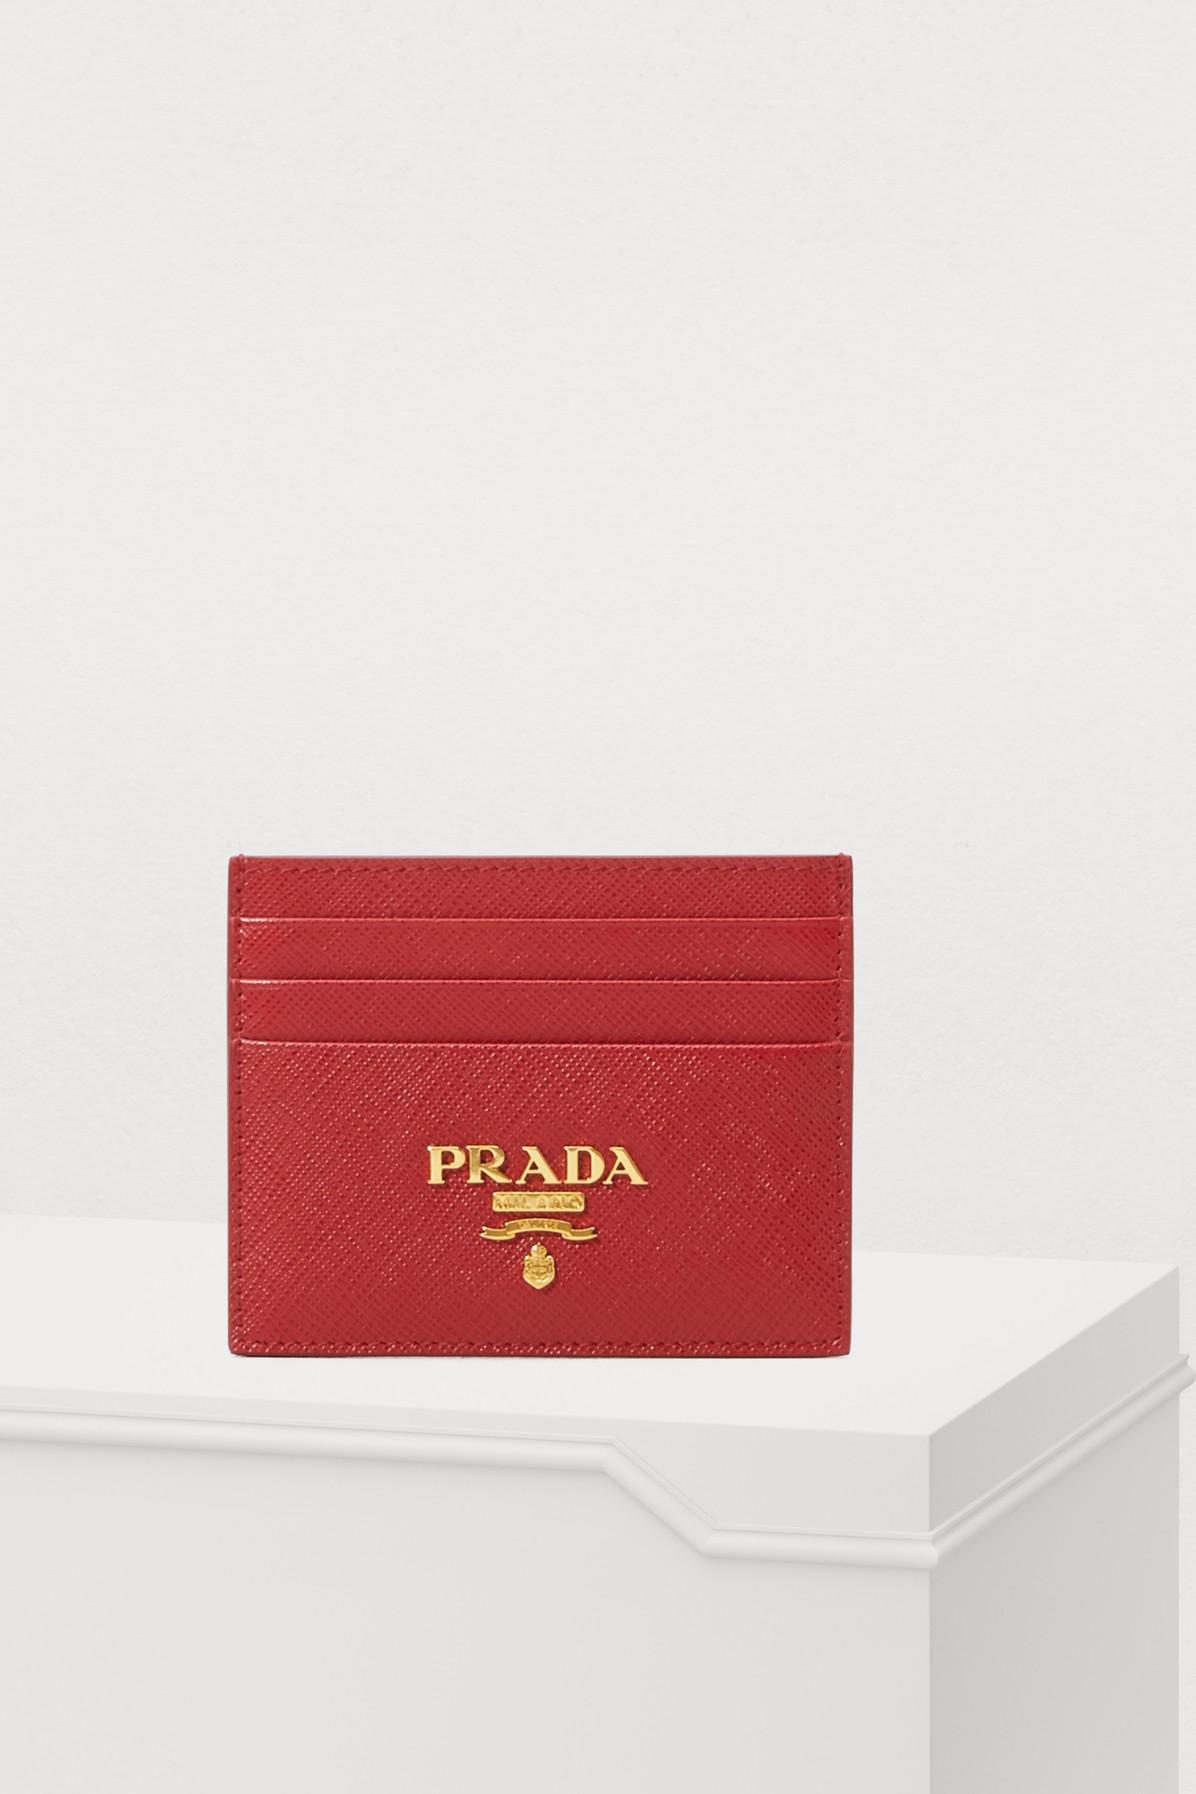 ba08c074c17c60 ... denmark prada red card holder lyst. view fullscreen c41b5 c566b